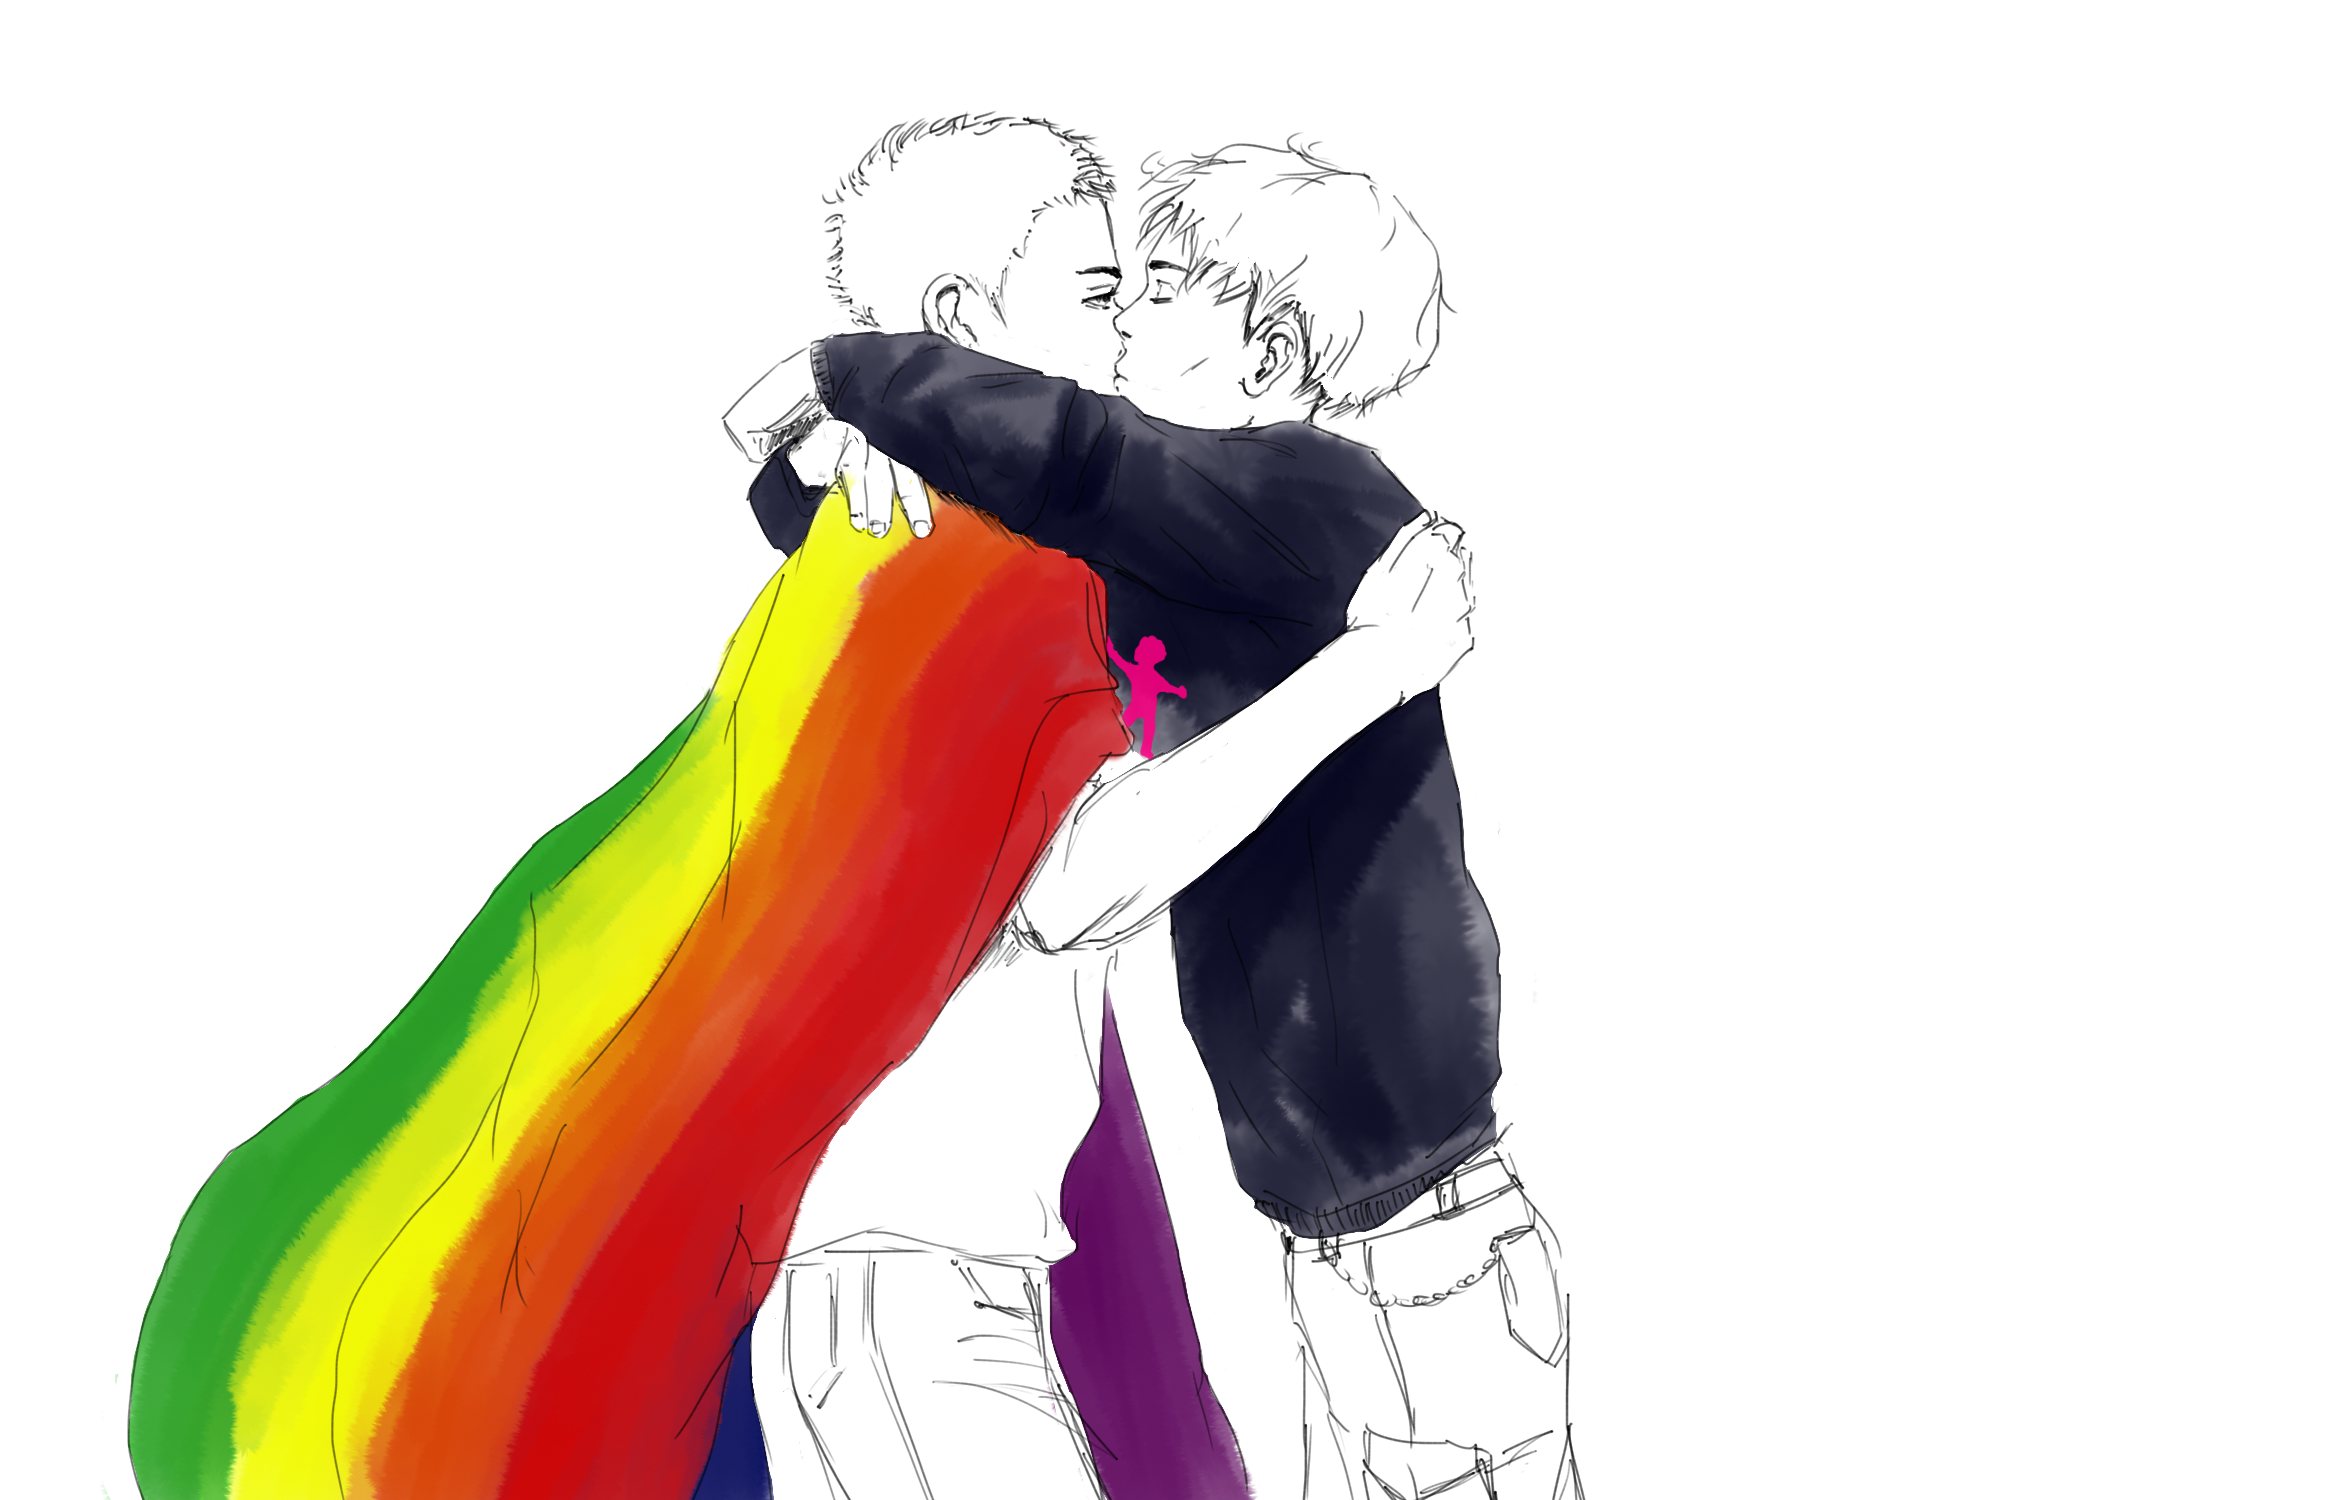 baiser gay manif pour tous